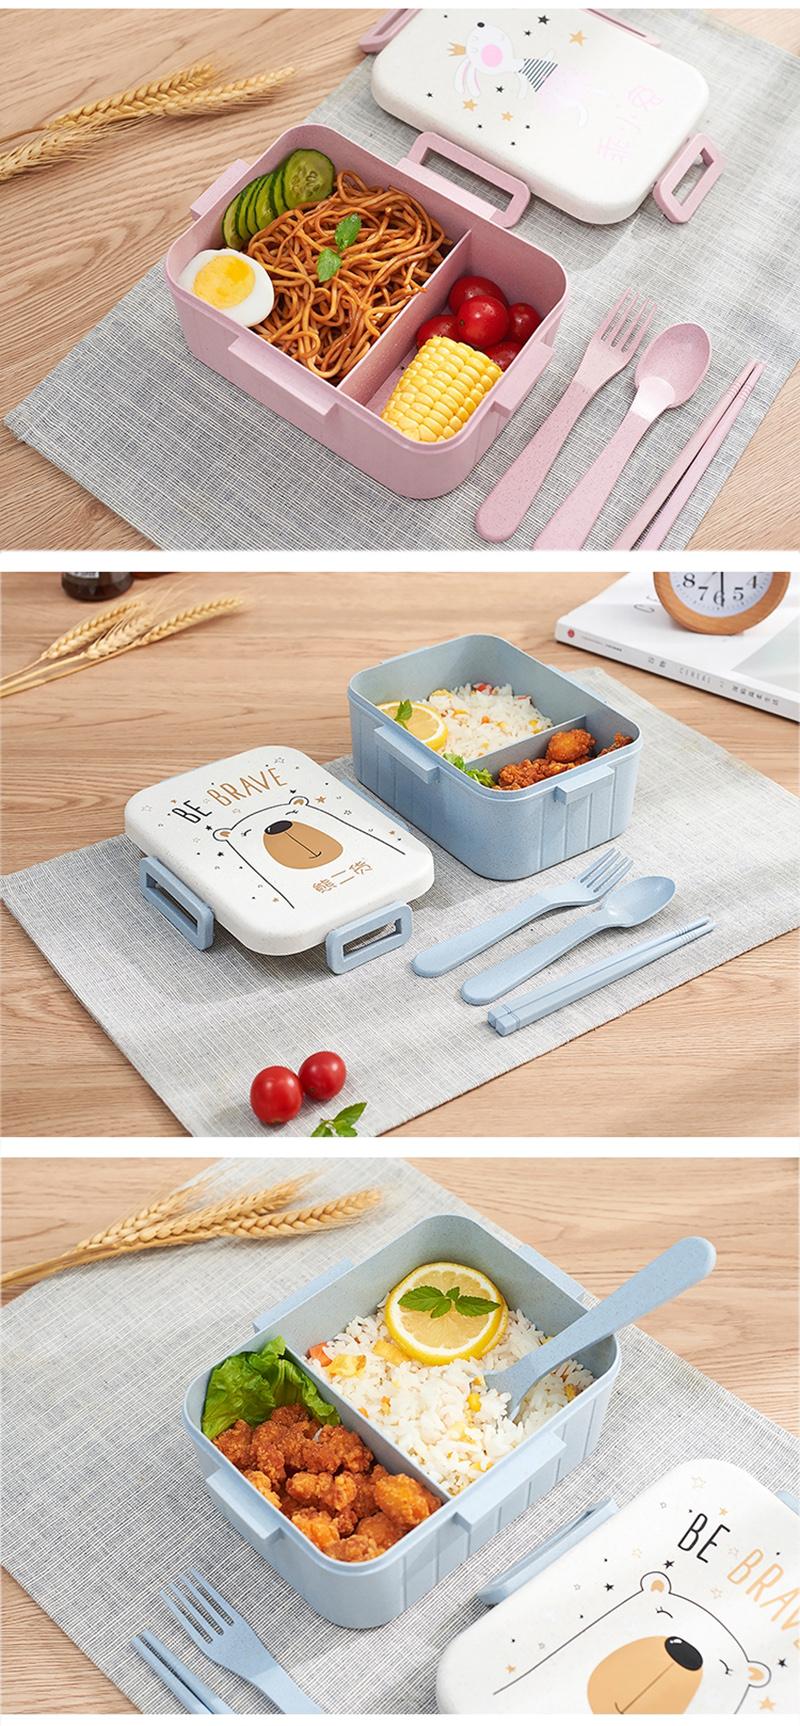 TUUTH Cute Cartoon Lunch Box Microwave Dinnerware Food Storage Container Children Kids School Office Portable Bento Box B1